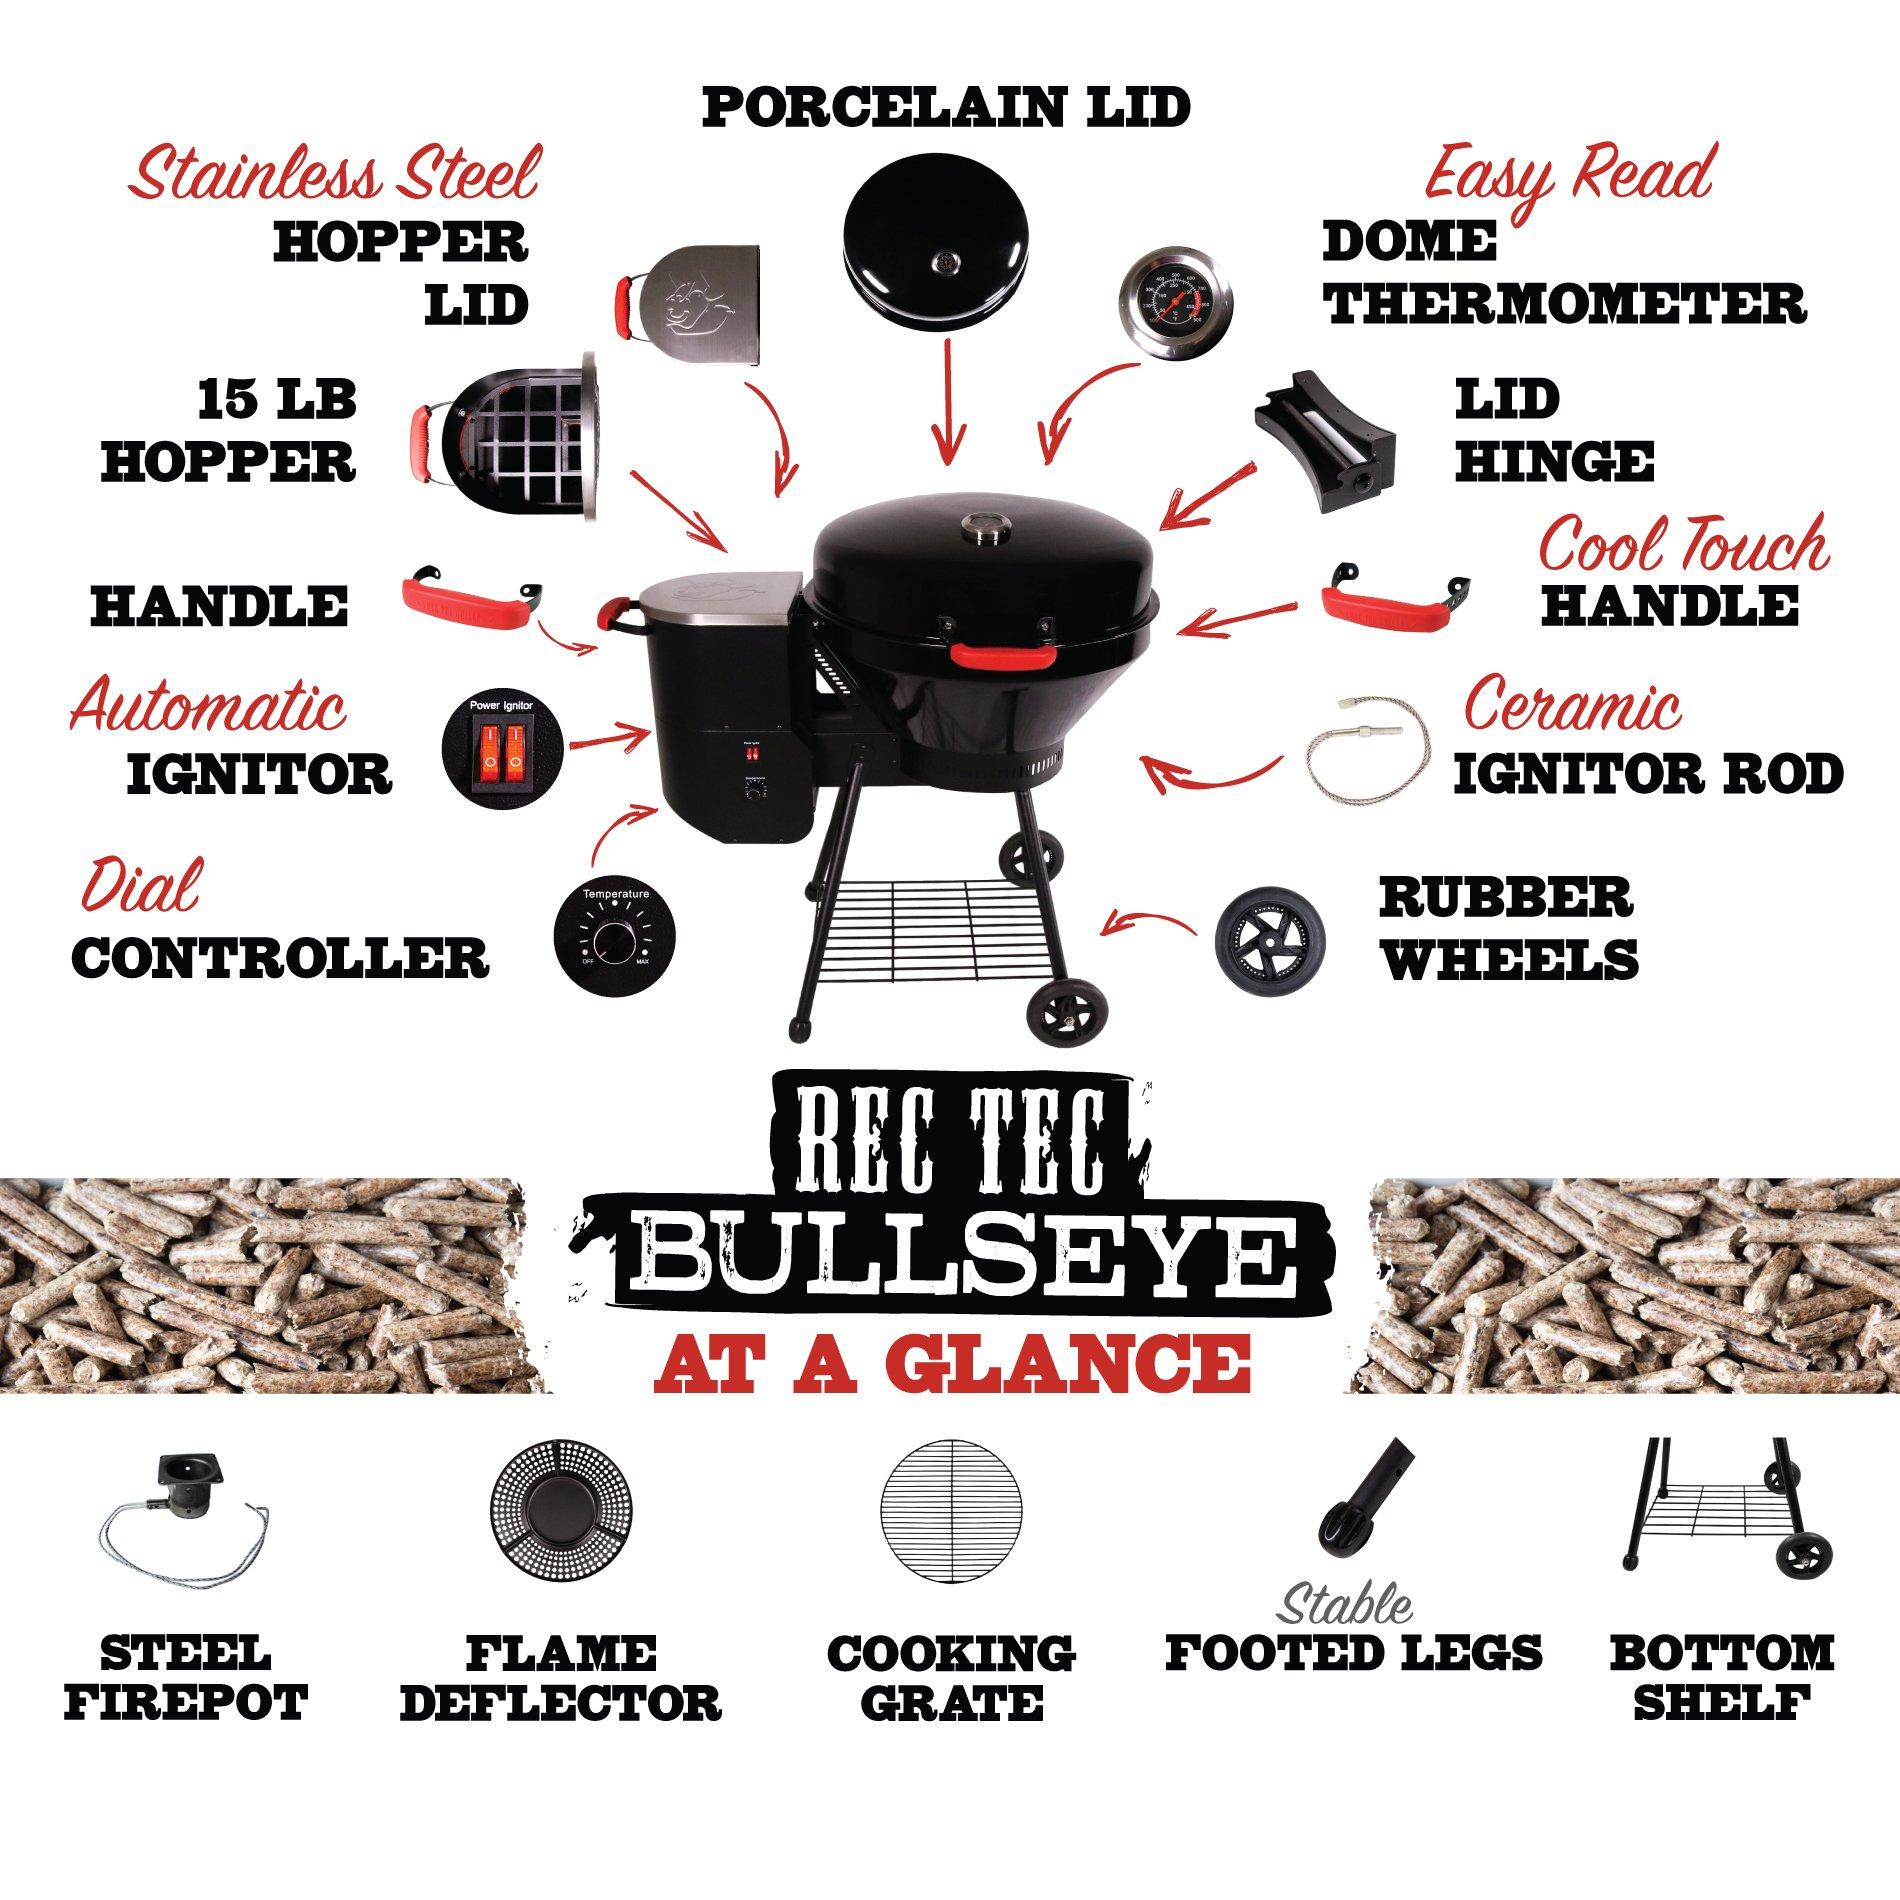 REC TEC Grills Bullseye | RT-B380 | Bundle | Wood Pellet Grill | 15lb Hopper | 2 Year Warranty | Hotflash Ceramic Ignition System by REC TEC Grills (Image #6)